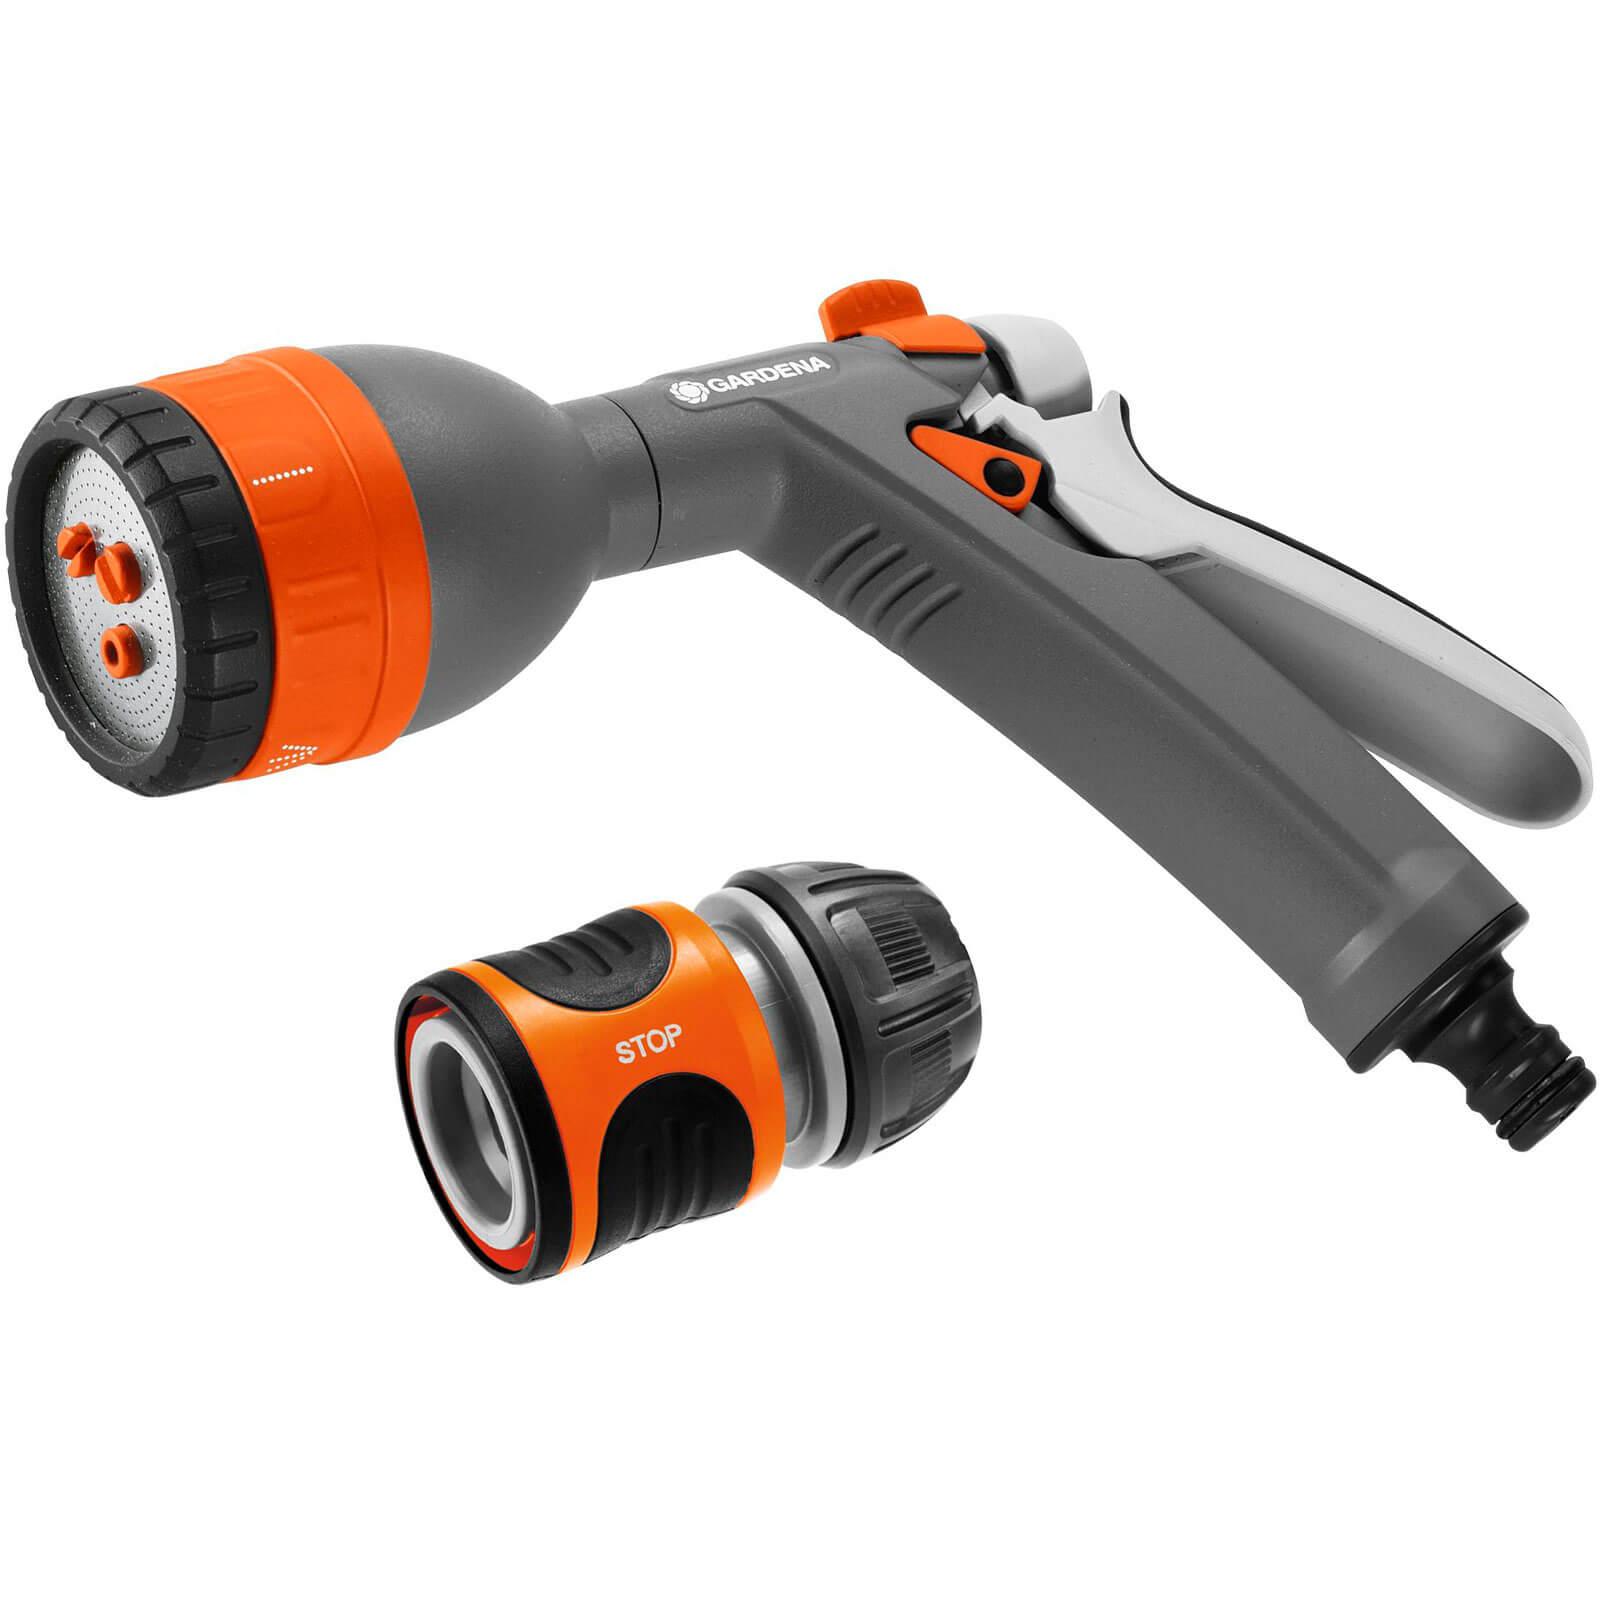 Image of Gardena 4 Pattern Multi Spray Gun